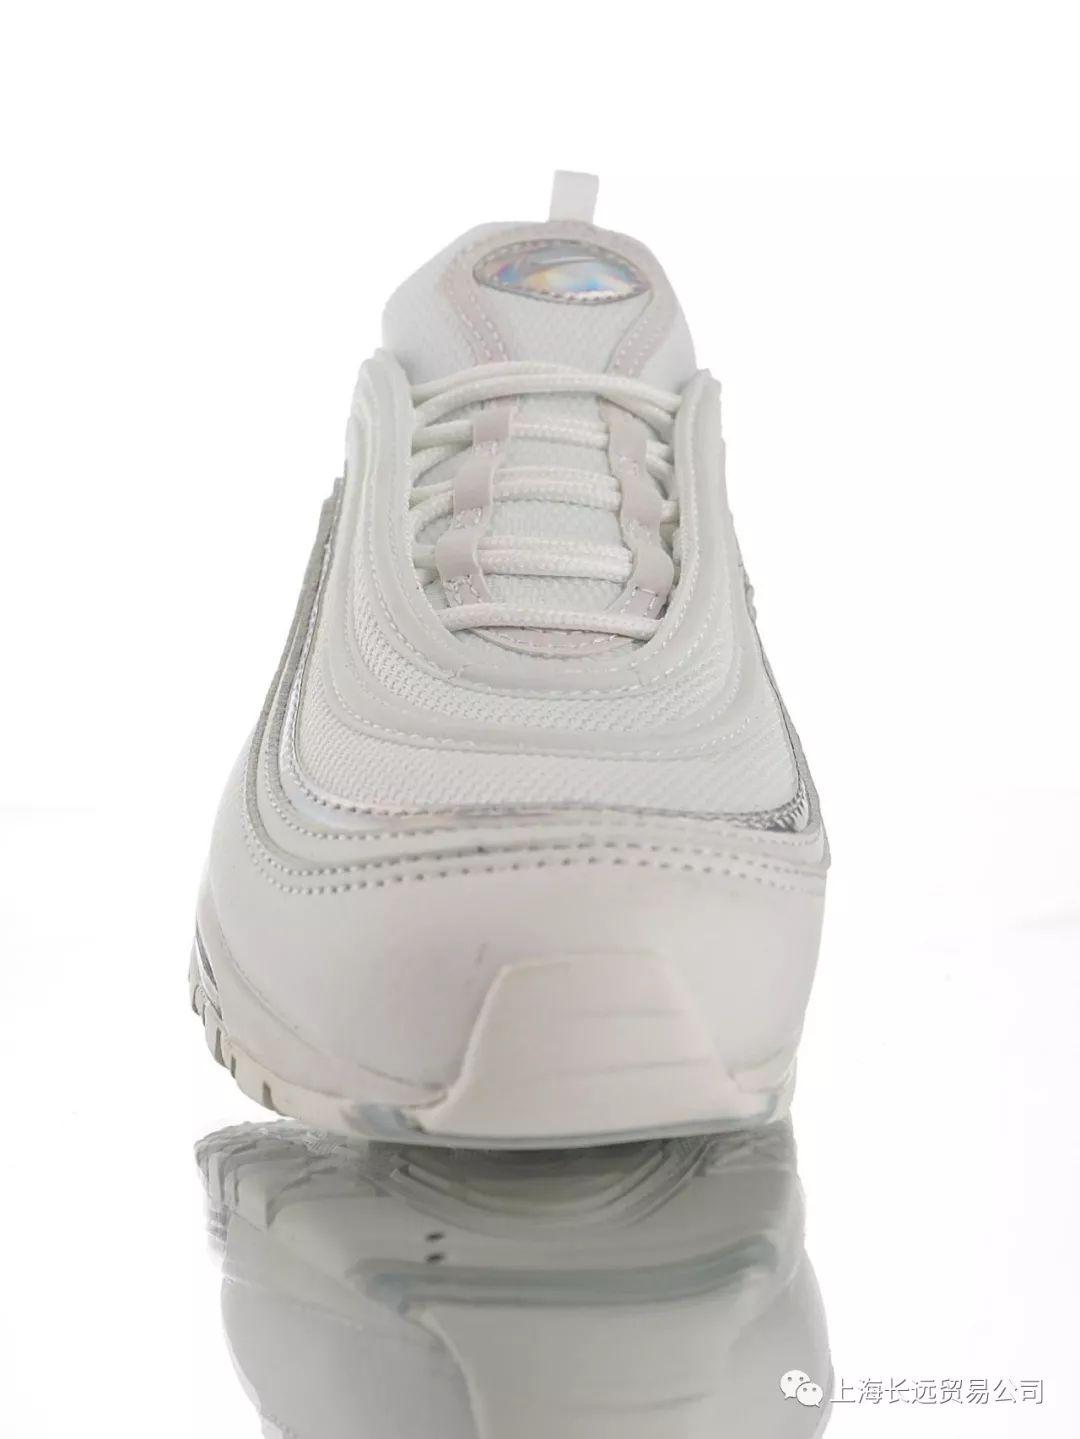 Nike Air Max 97 Lx in Natural Lyst